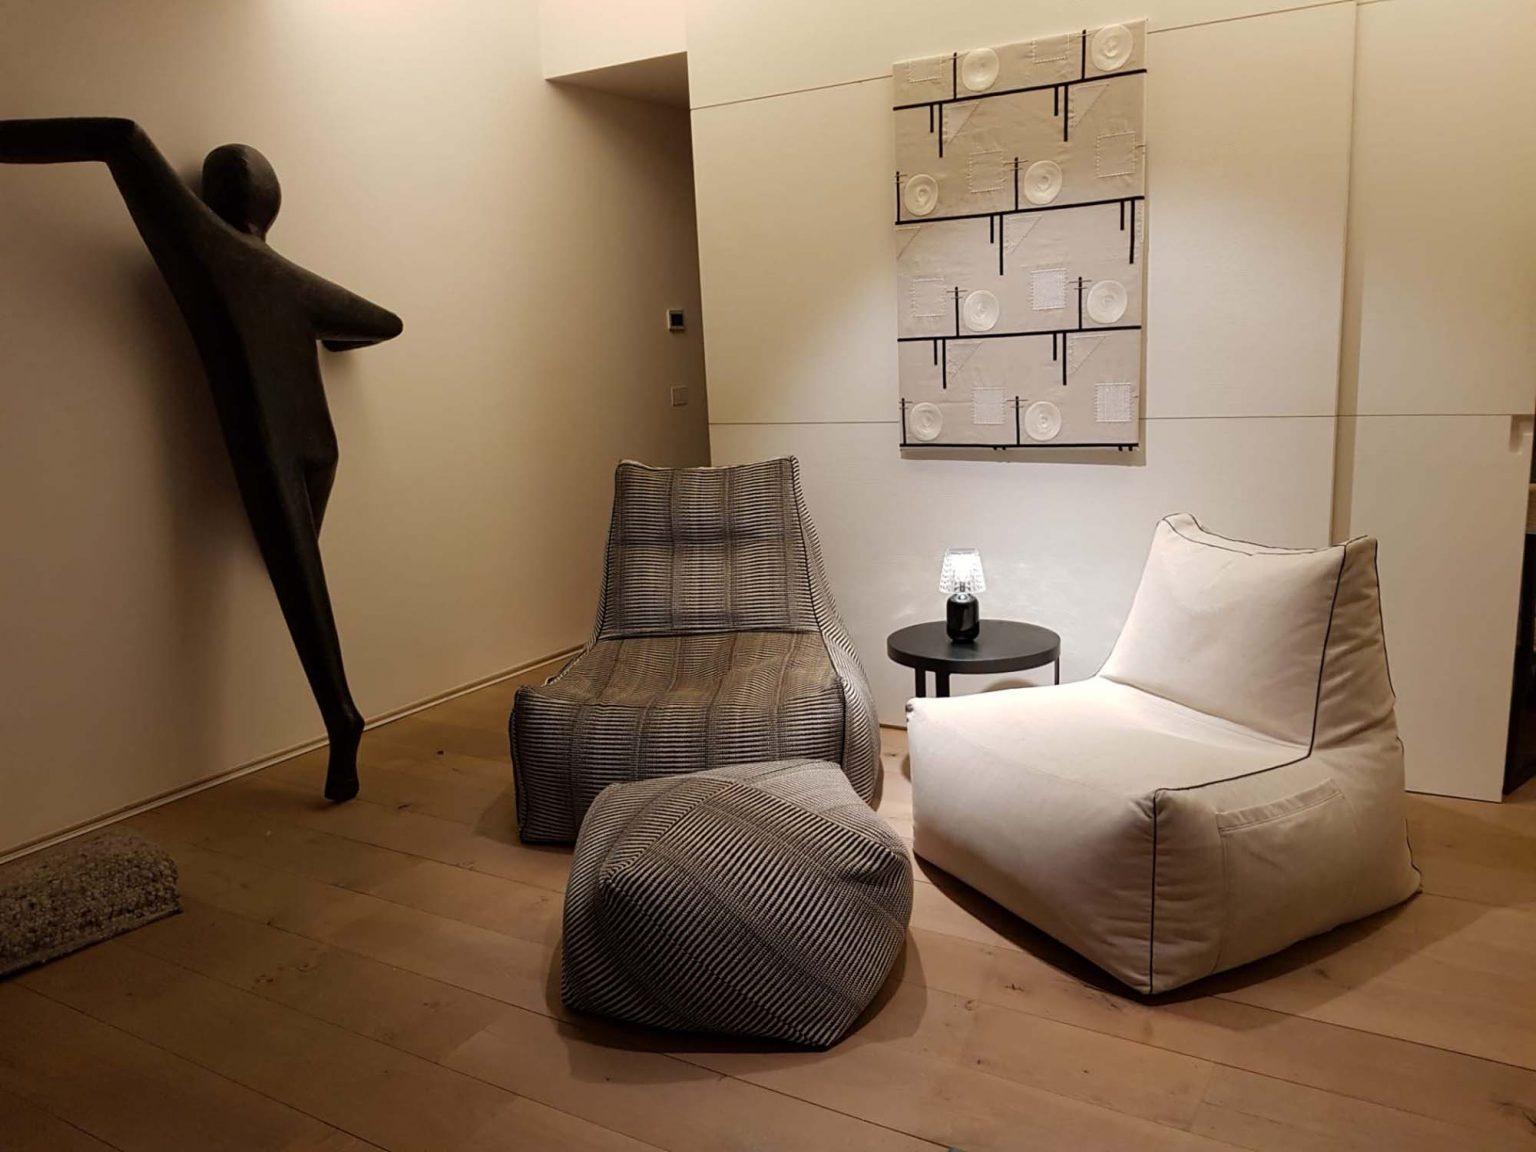 Biennale Interieur - Belgium's leading design and interior event - Unknown-9.jpeg